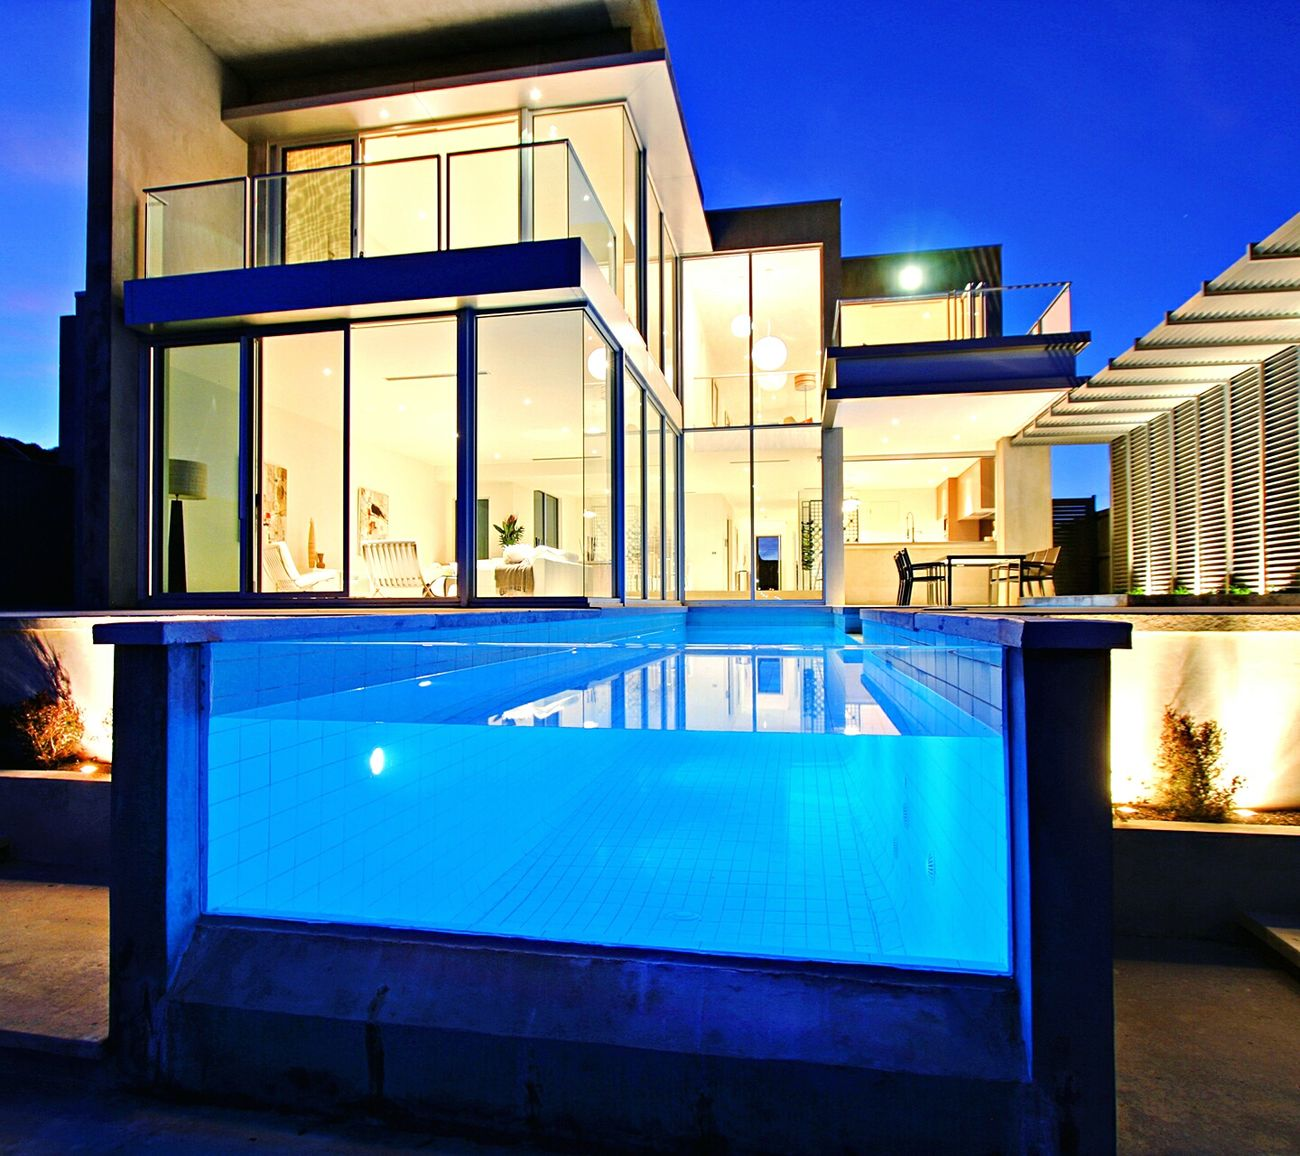 My Dream House plz like